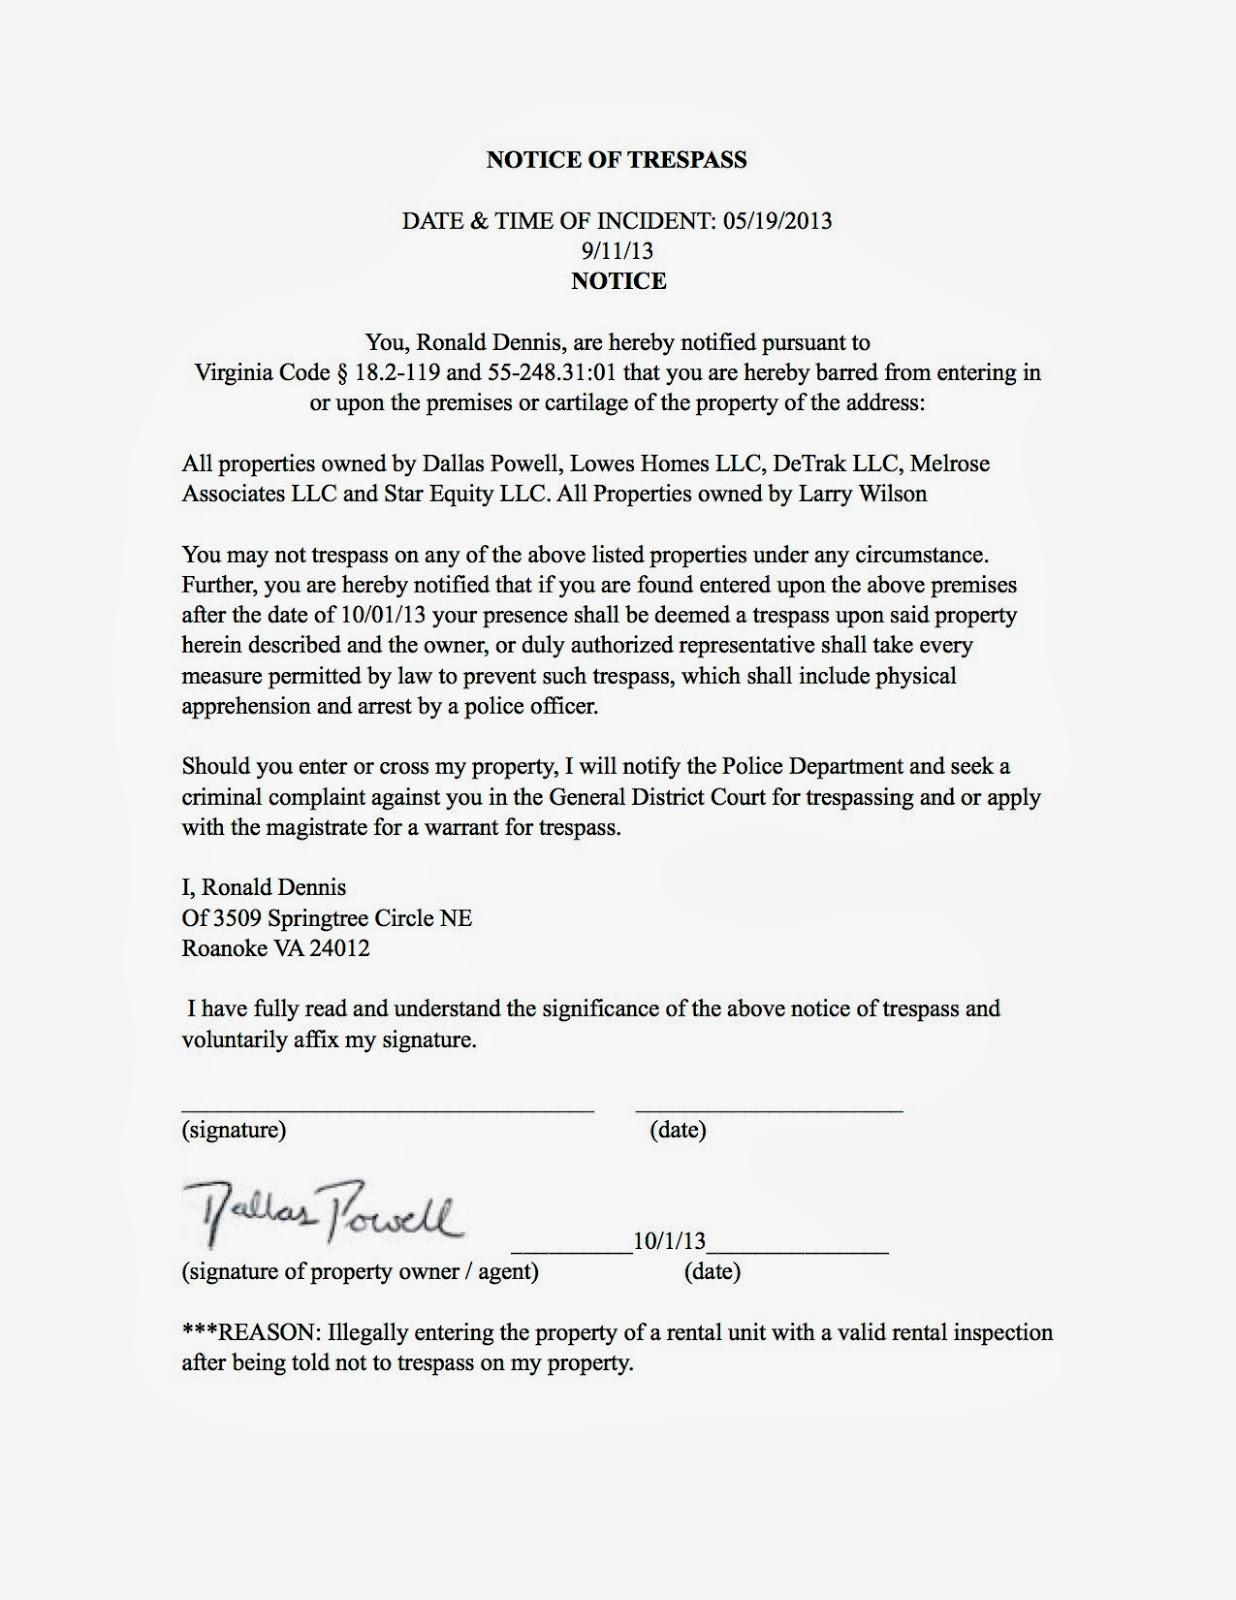 Real estate investors of virginia ronald dennis notice of trespass spiritdancerdesigns Choice Image